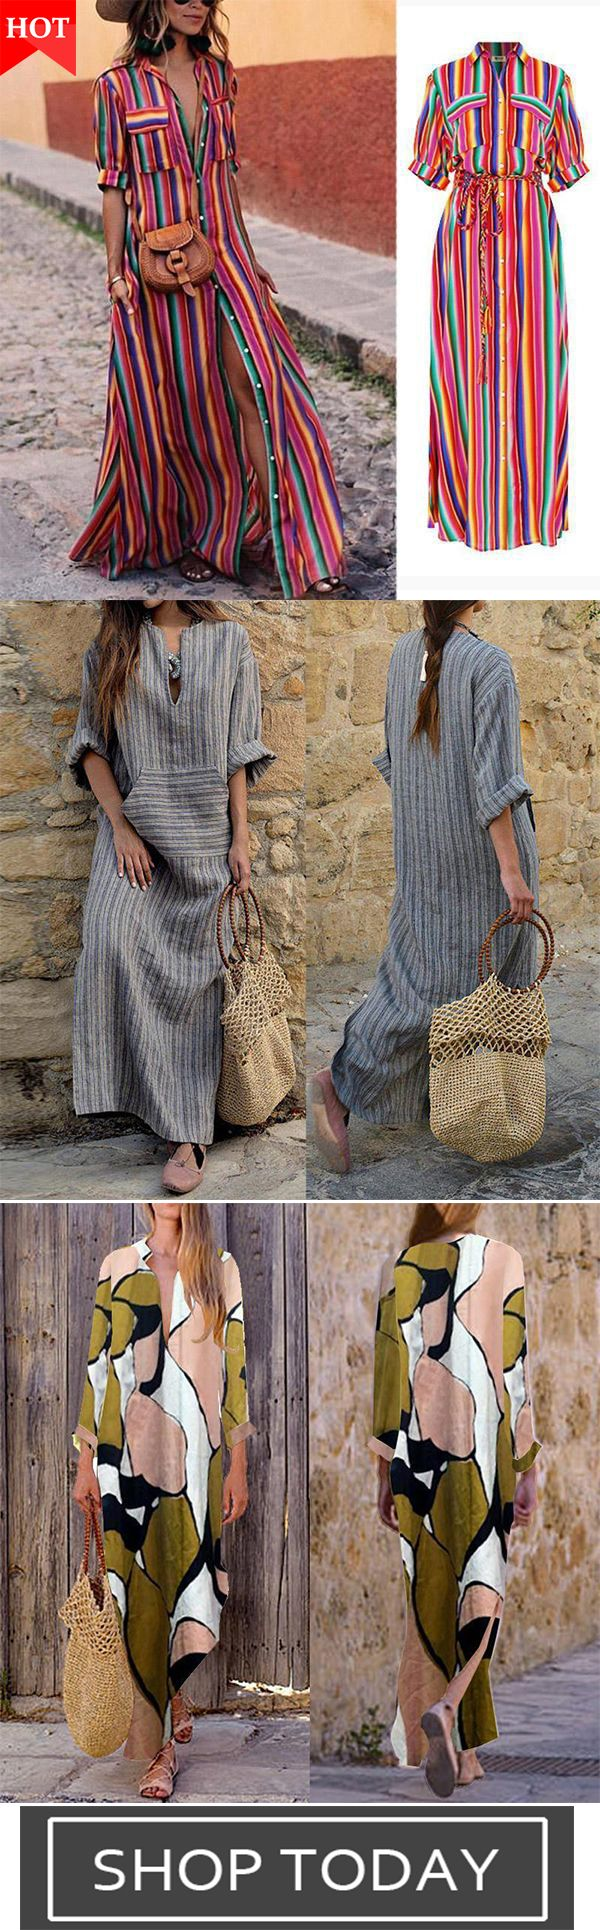 b605fd7fdf9 Button Down Collar Stripes Roll Up Sleeve Half Sleeve Maxi Dresses Casual  Loose Maxi Dresses Cotton Linen Striped Long Sleeve Dress Fashion Print V  Neck ...